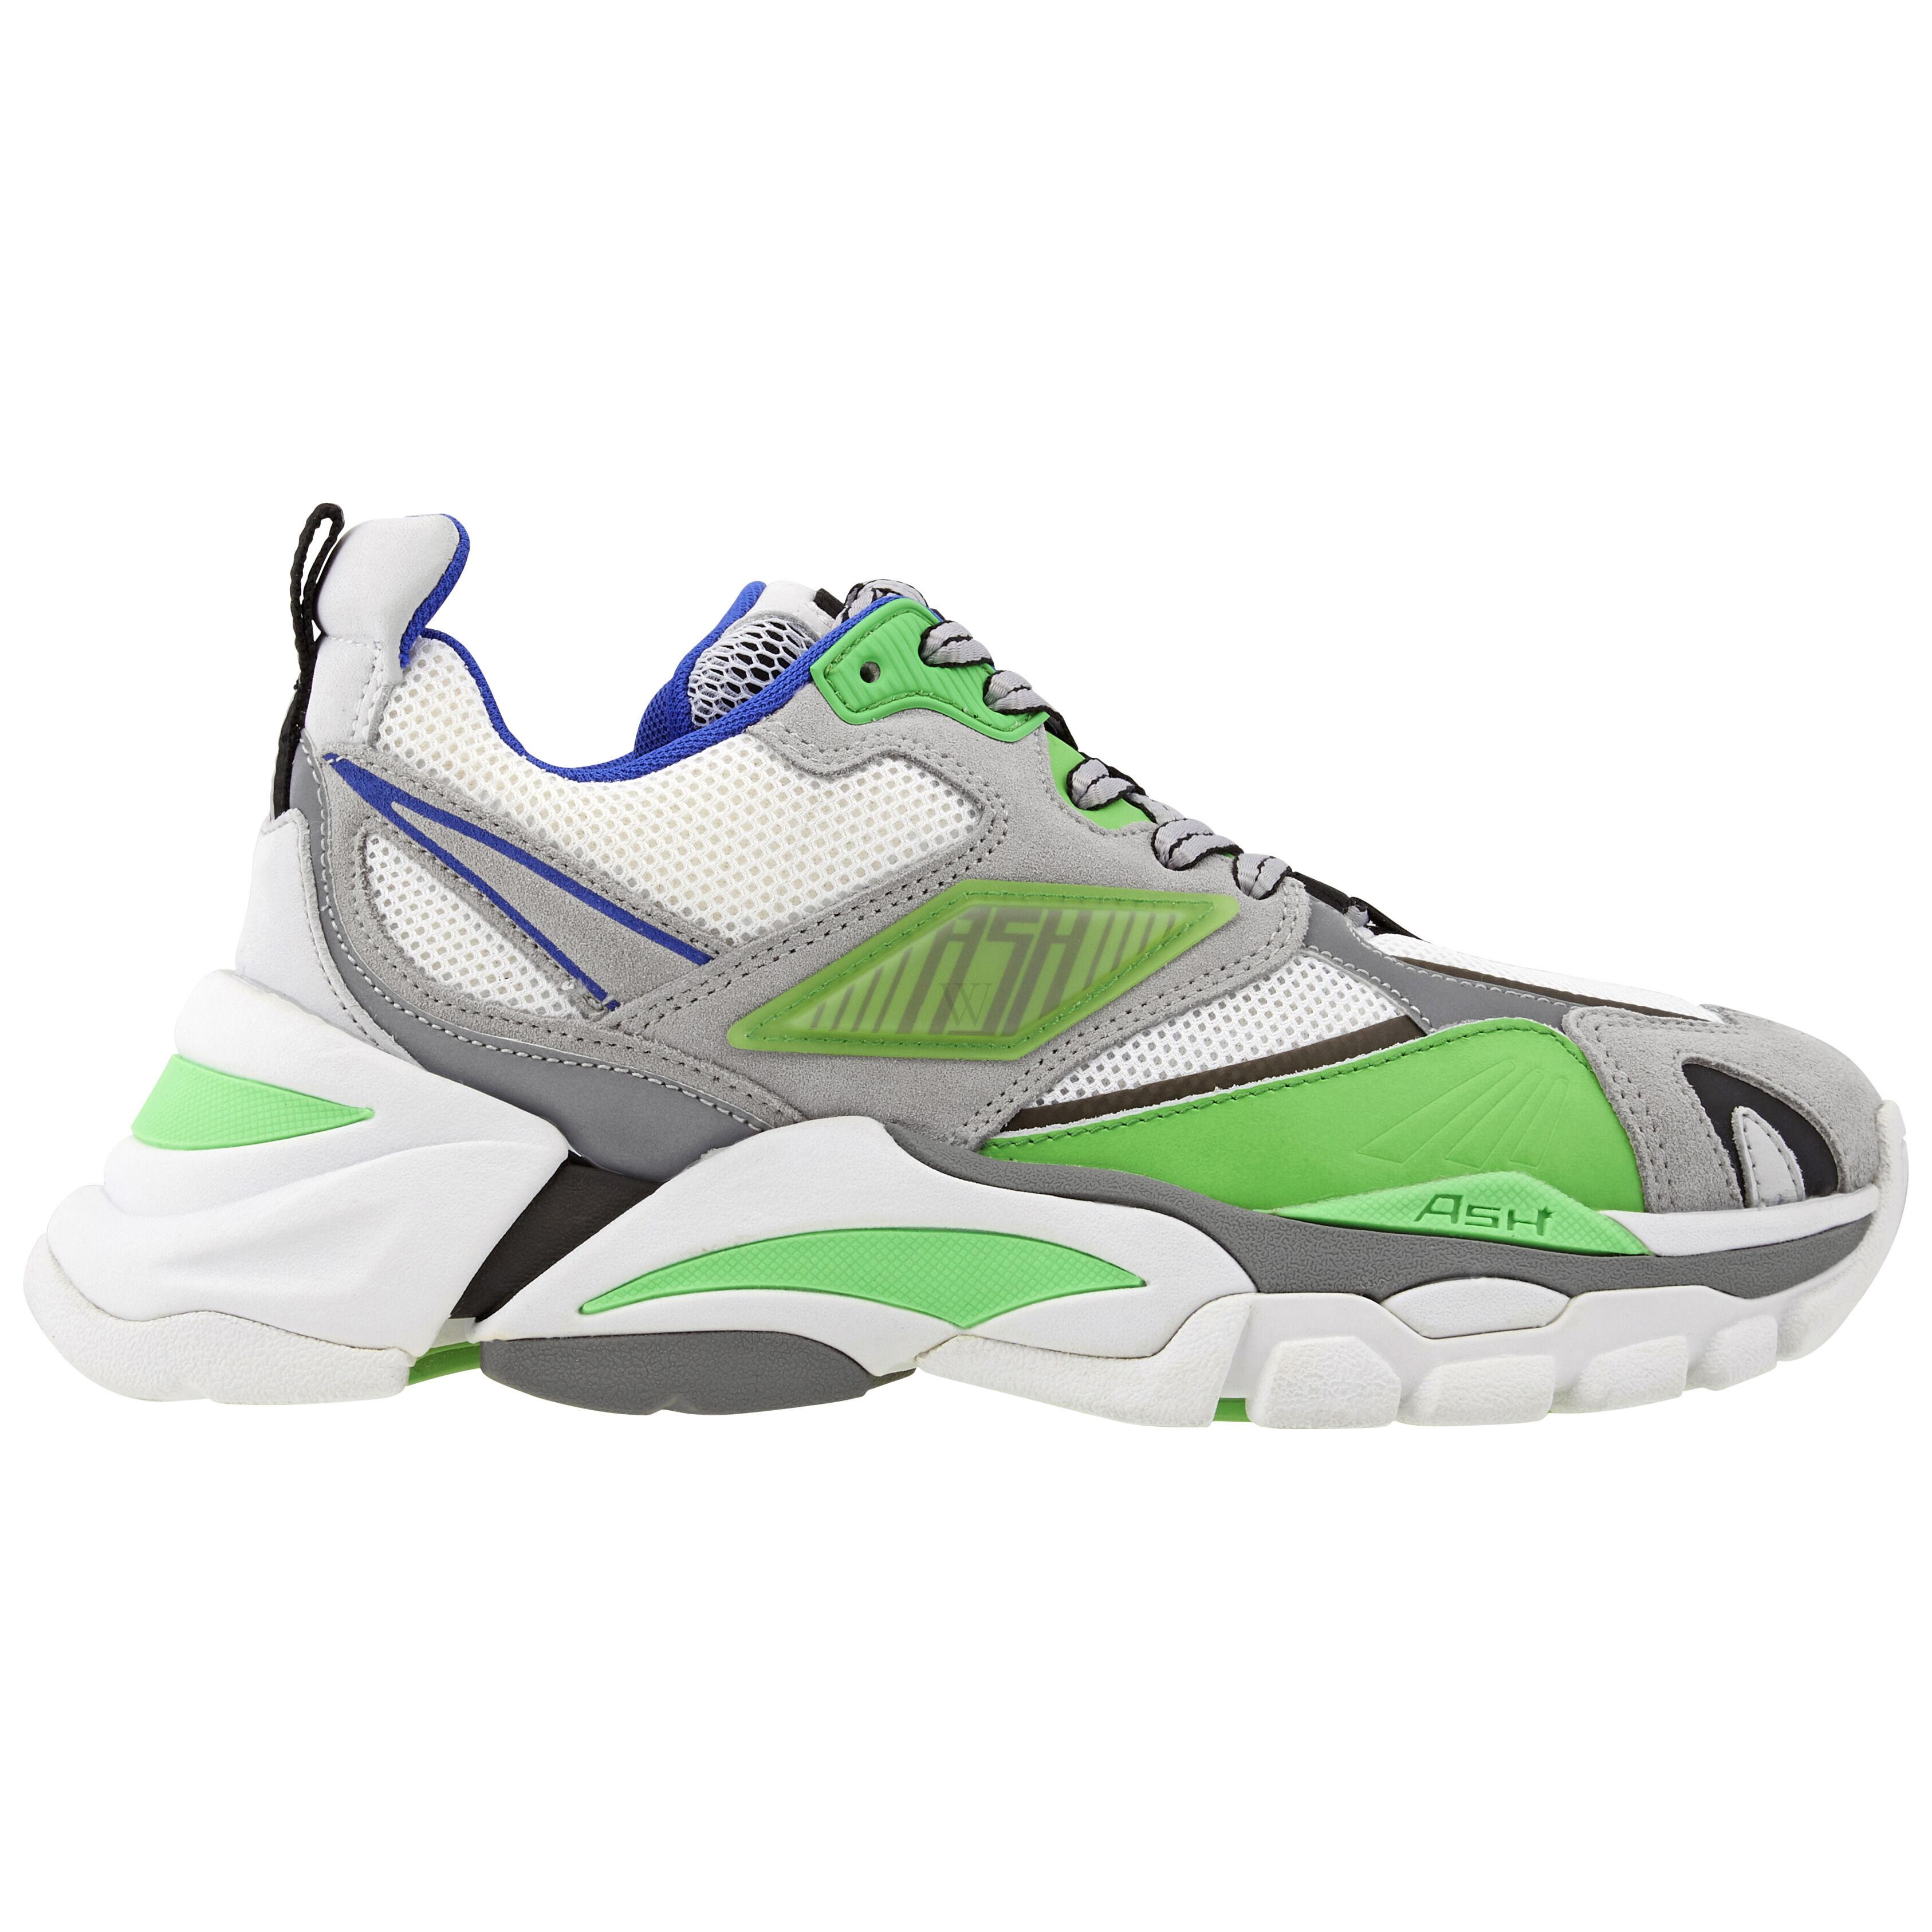 Ladies Flex Sneakers, Brand Size